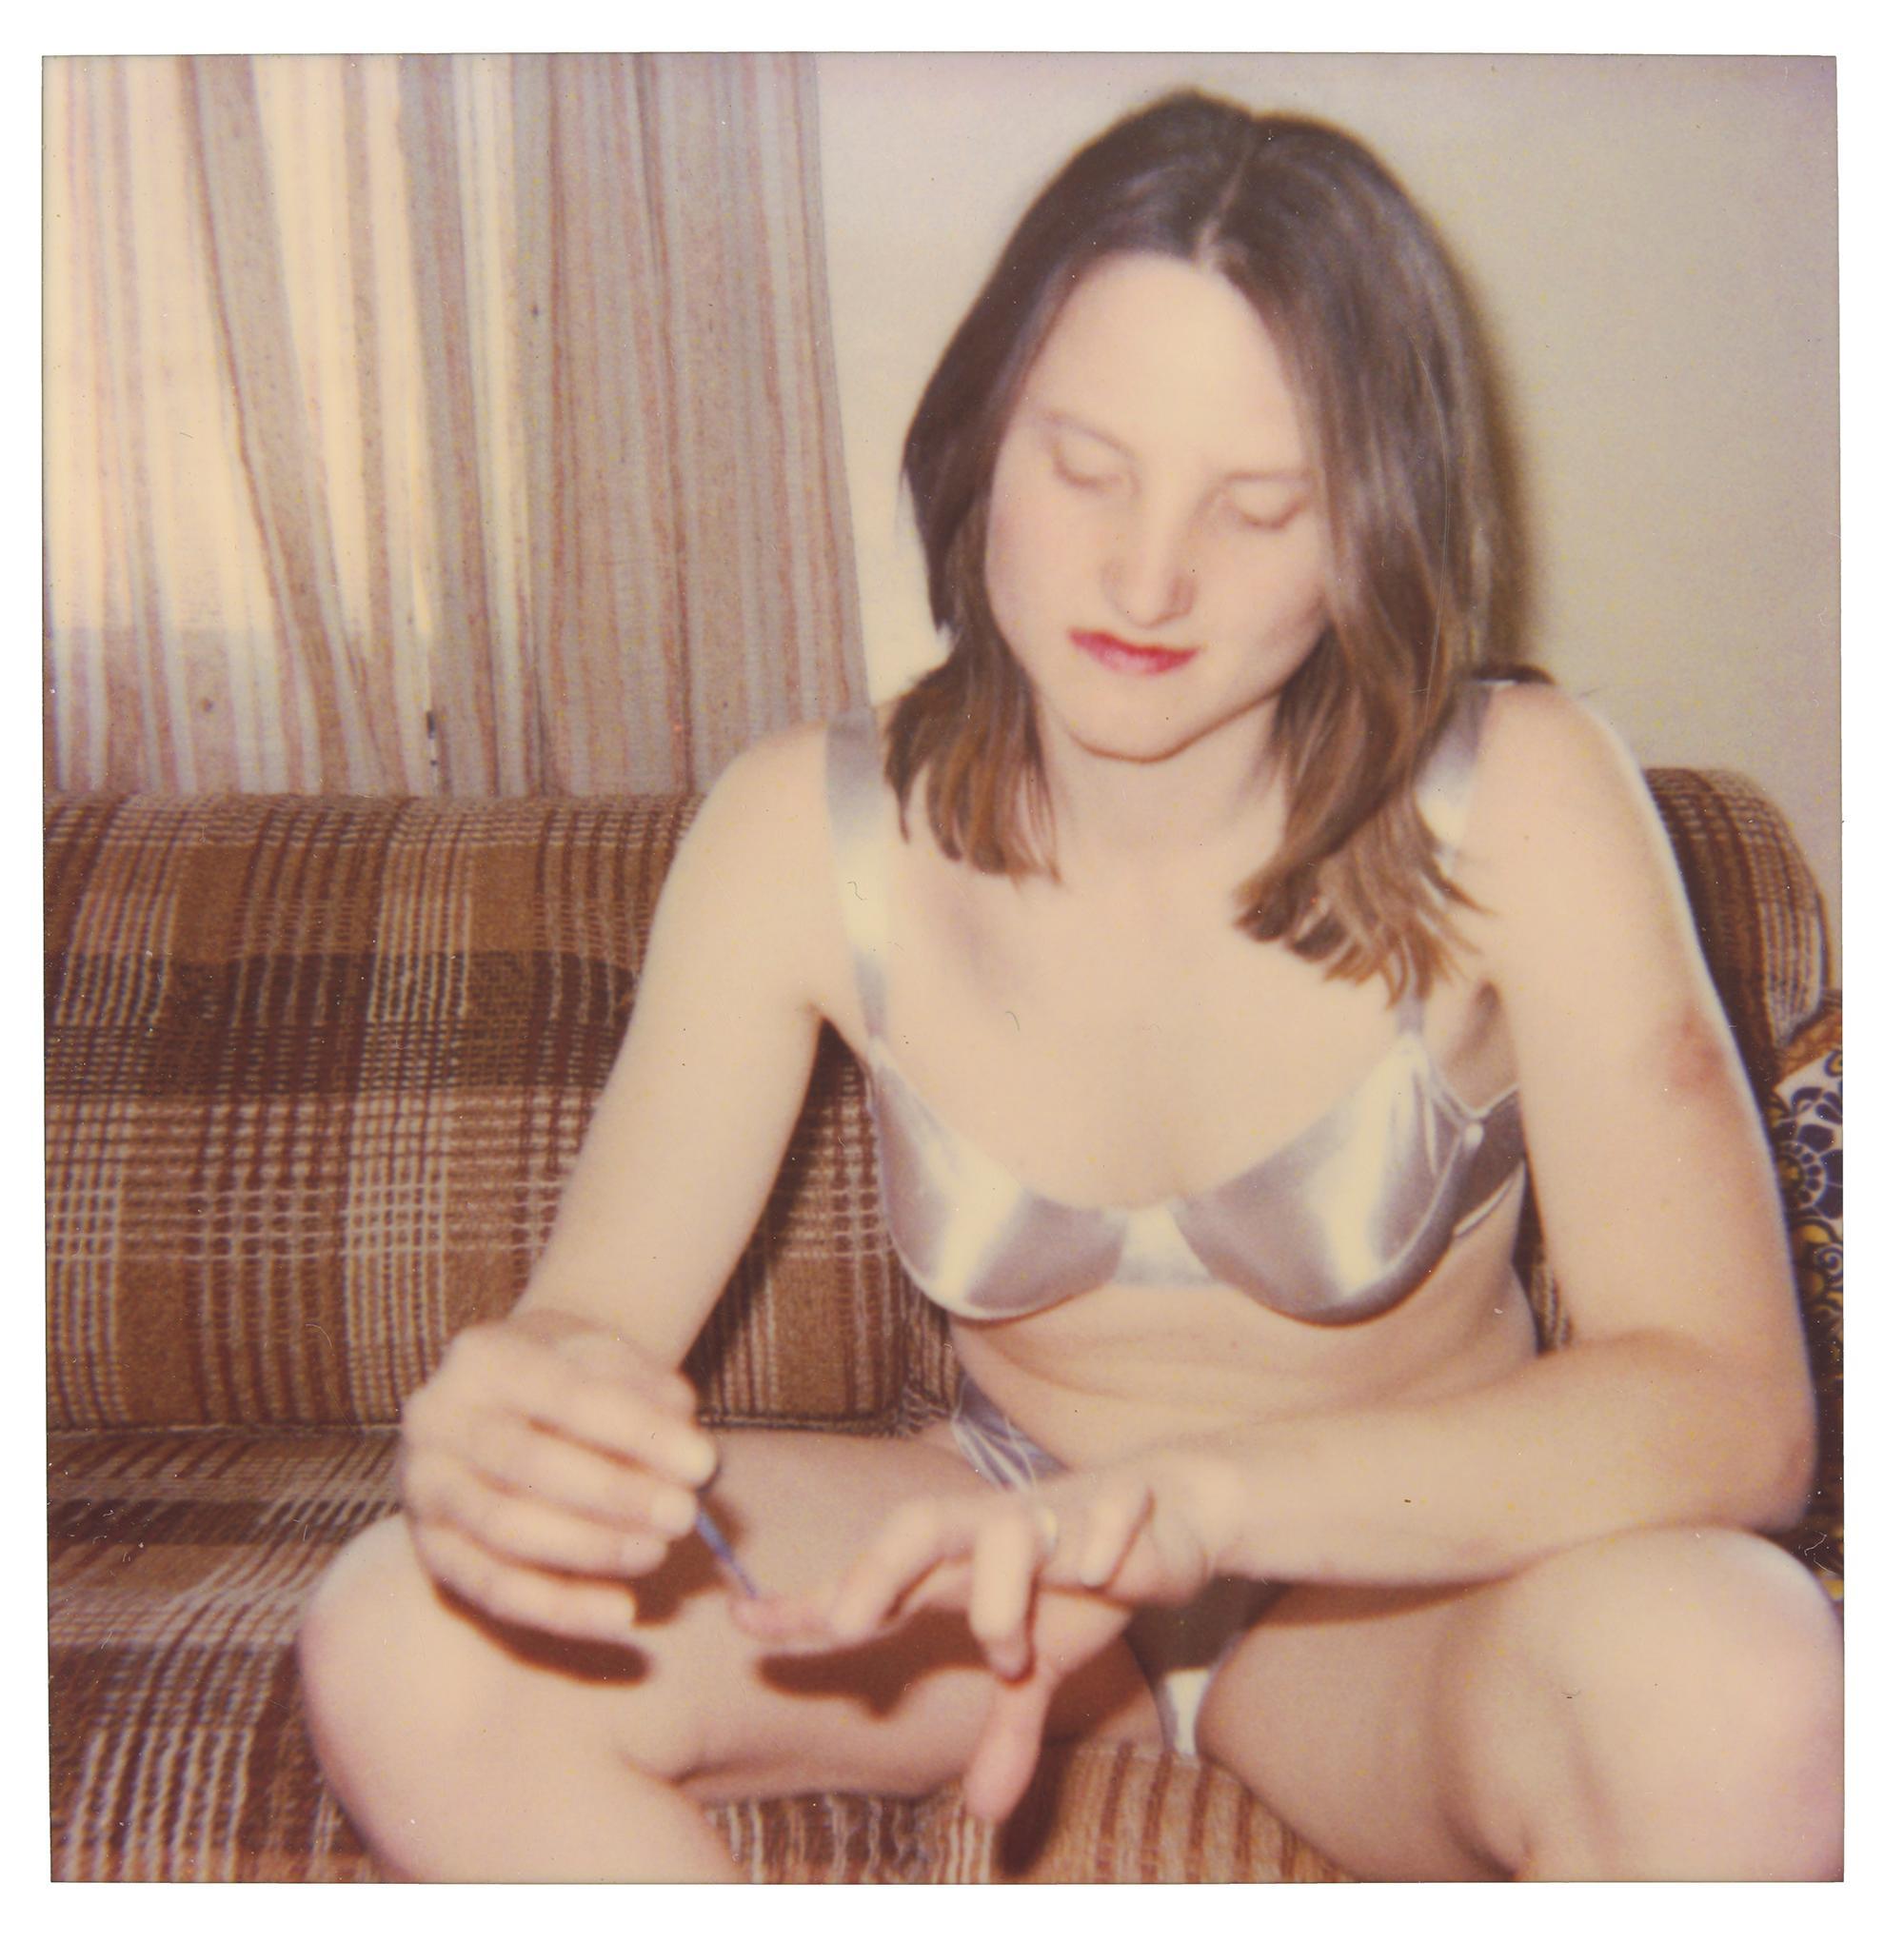 Kirsten doing her Nails (50x50cm) - Figurative, Portrait, Polaroid, Photograph